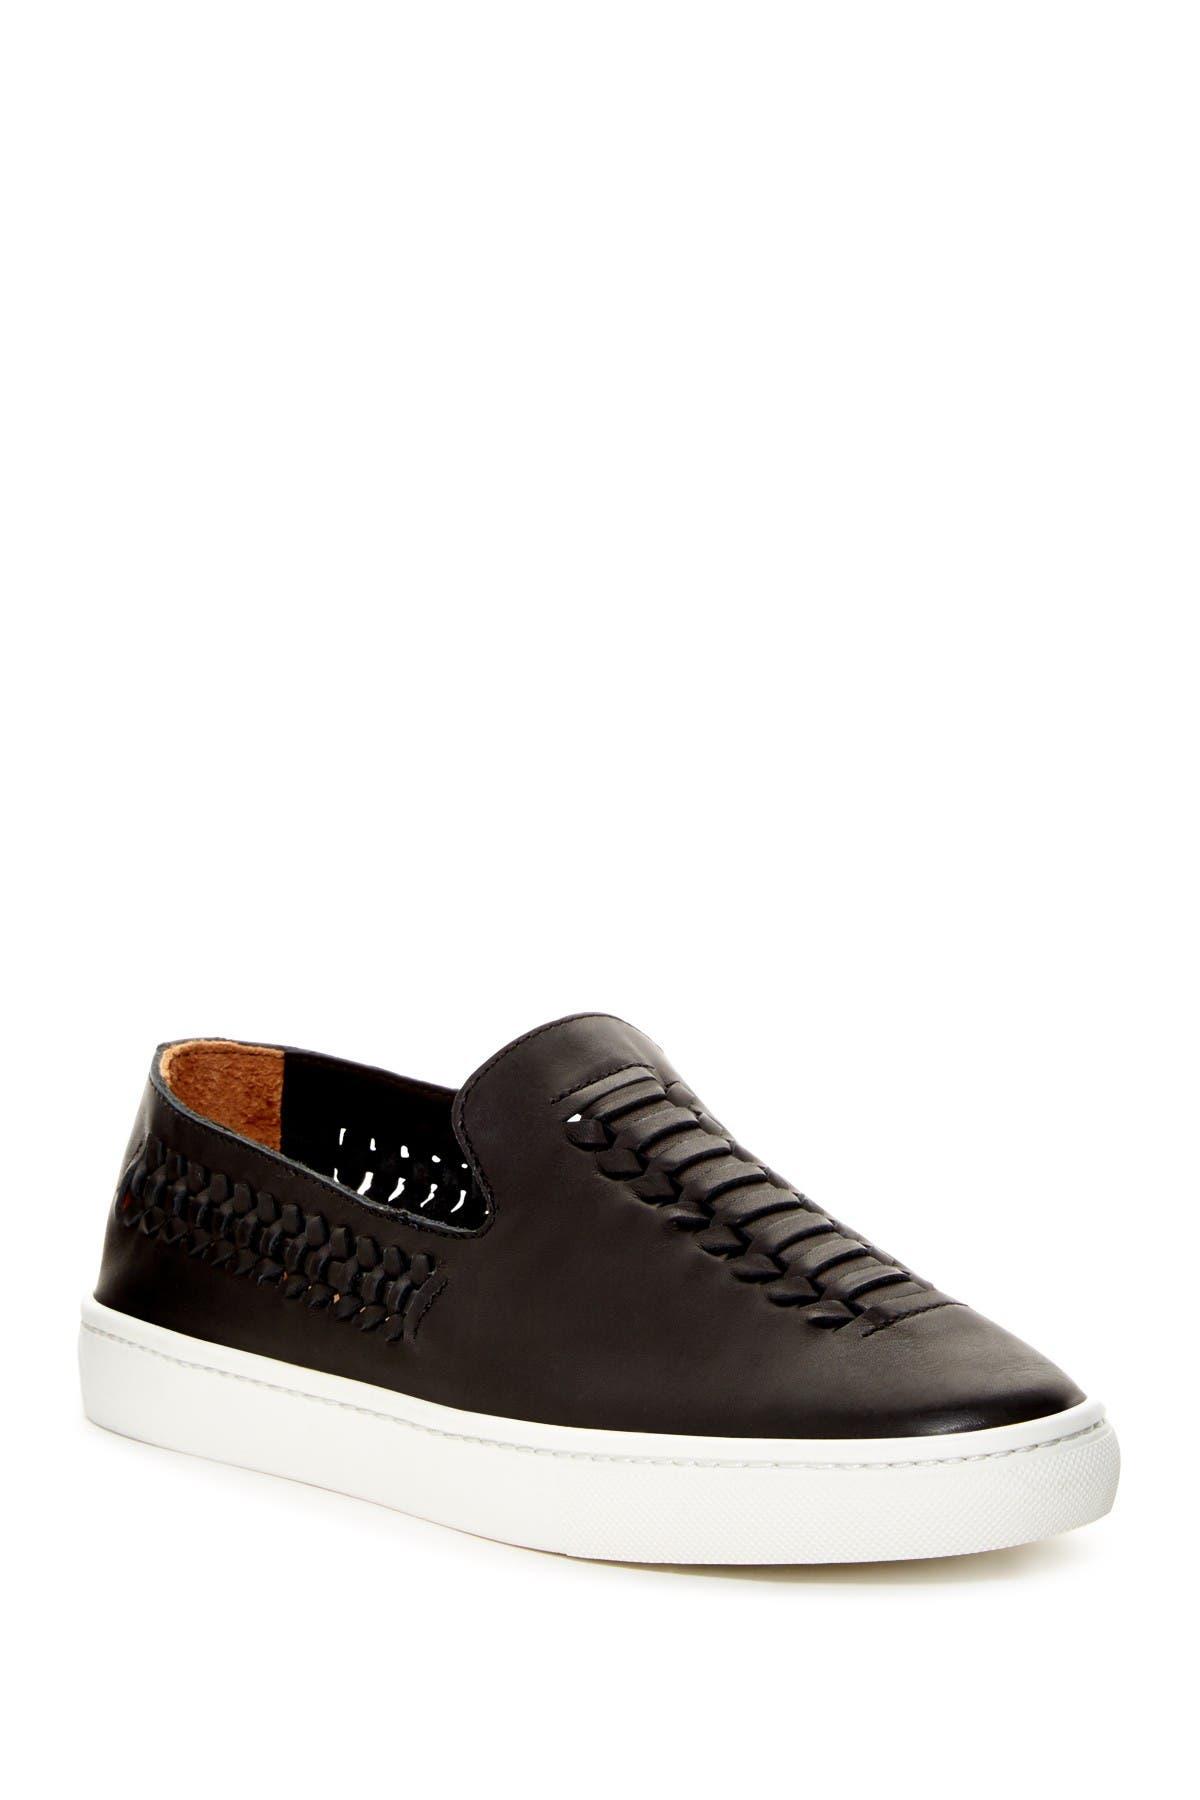 Image of Soludos Woven Slip-On Sneaker